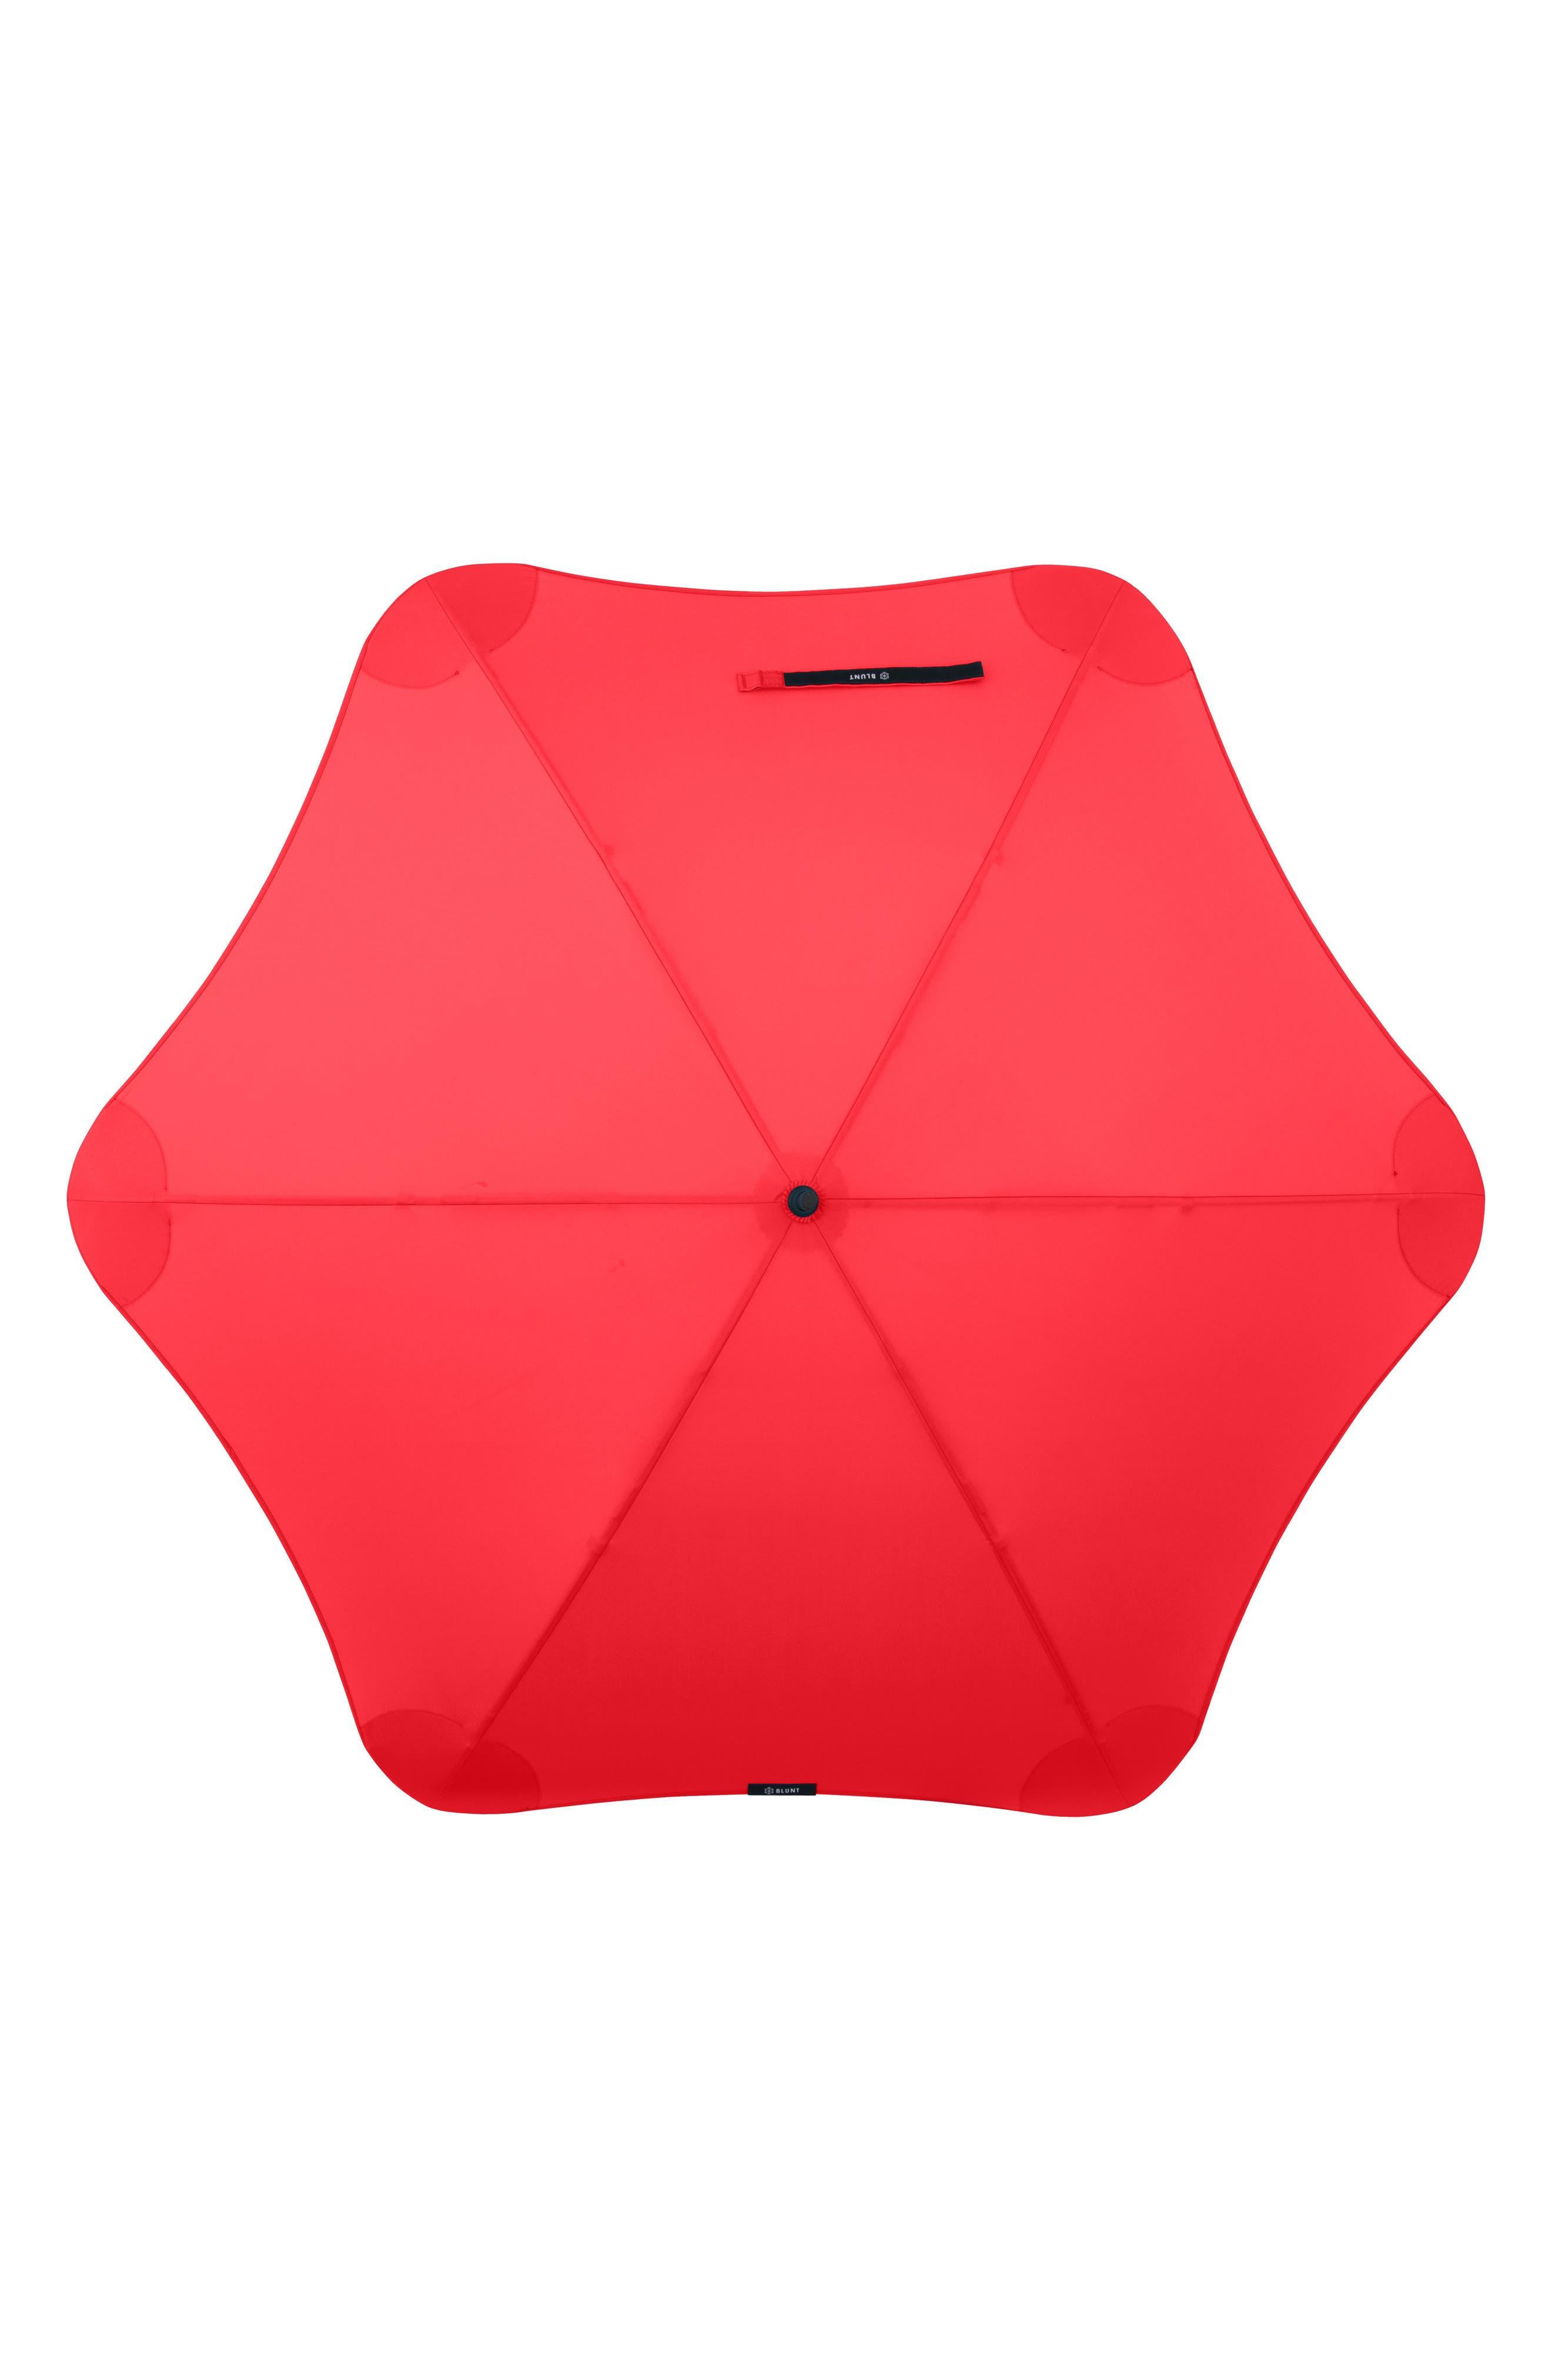 Classic Umbrella,                             Alternate thumbnail 3, color,                             Red